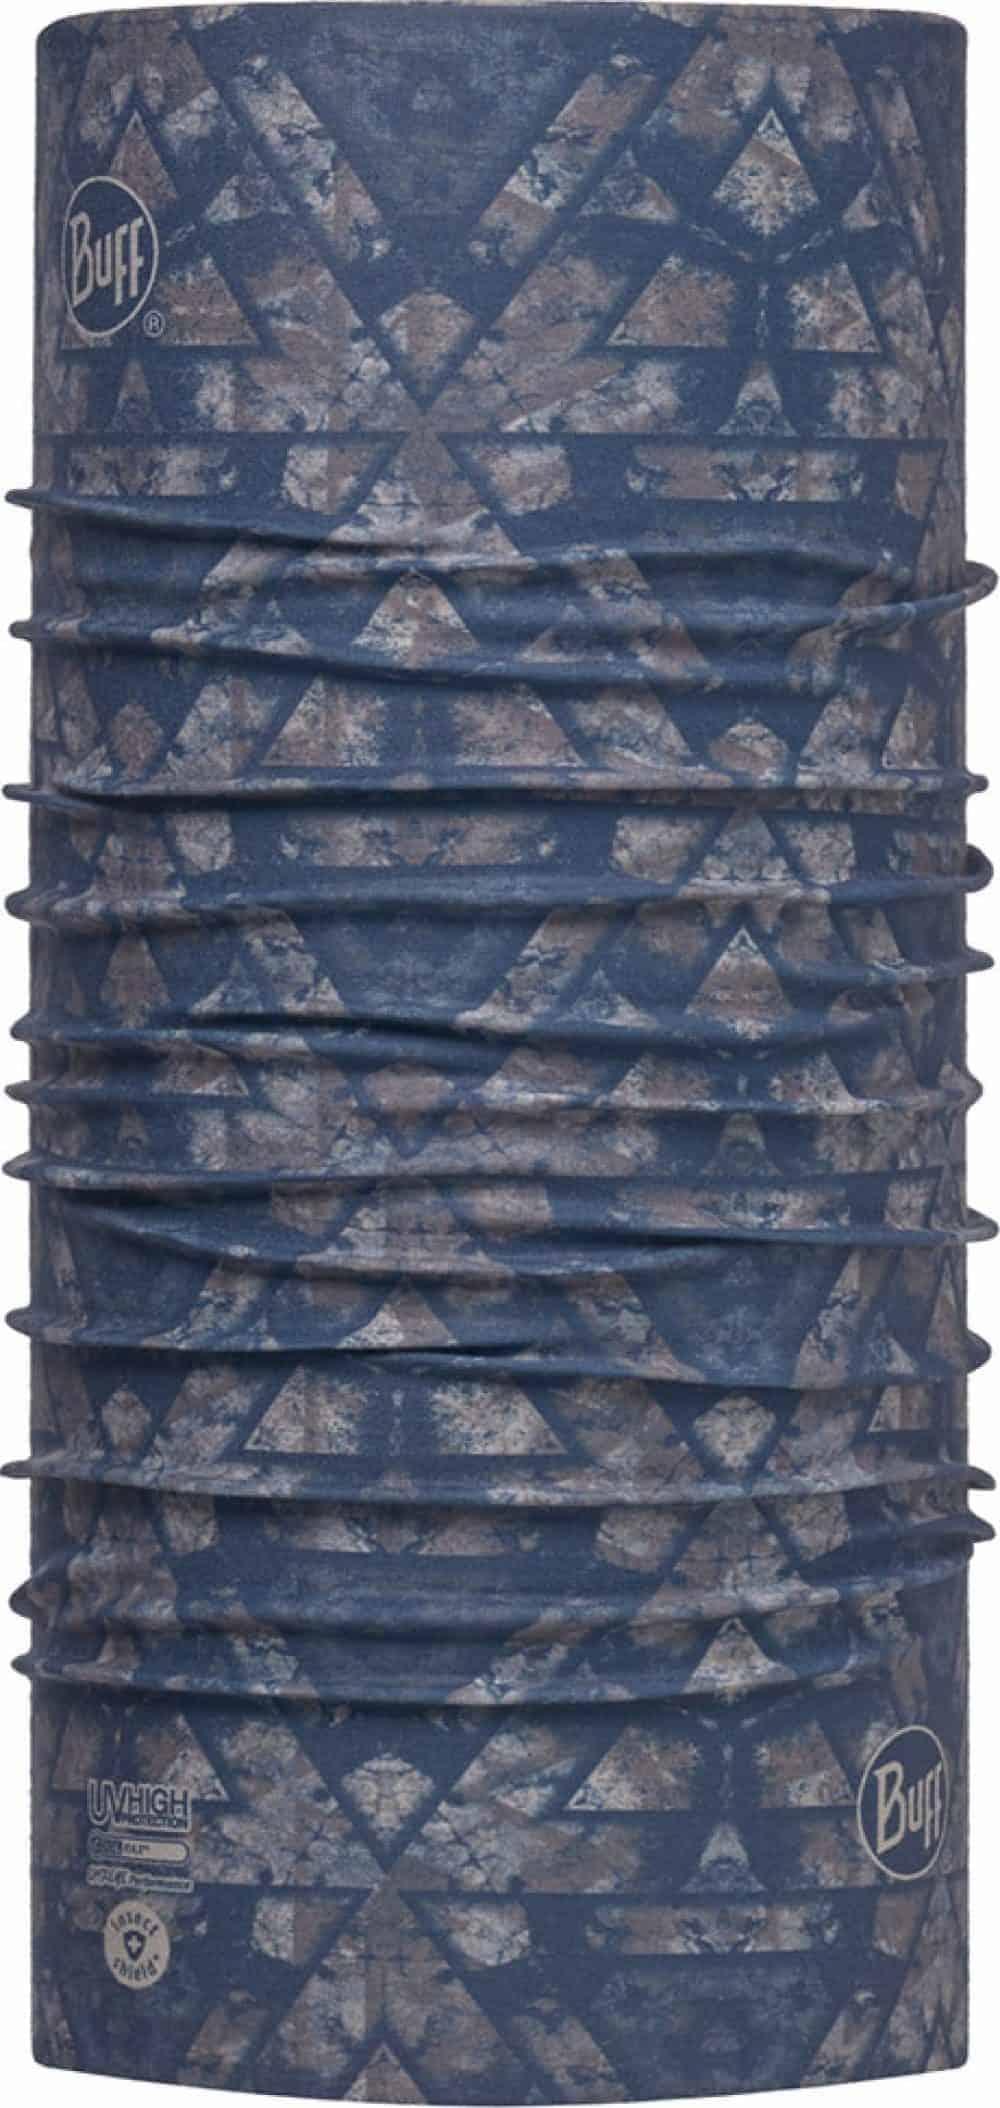 "Studio photo of the Insectshield™ High-UV Buff® design ""Unigami"". Source: buff.eu"